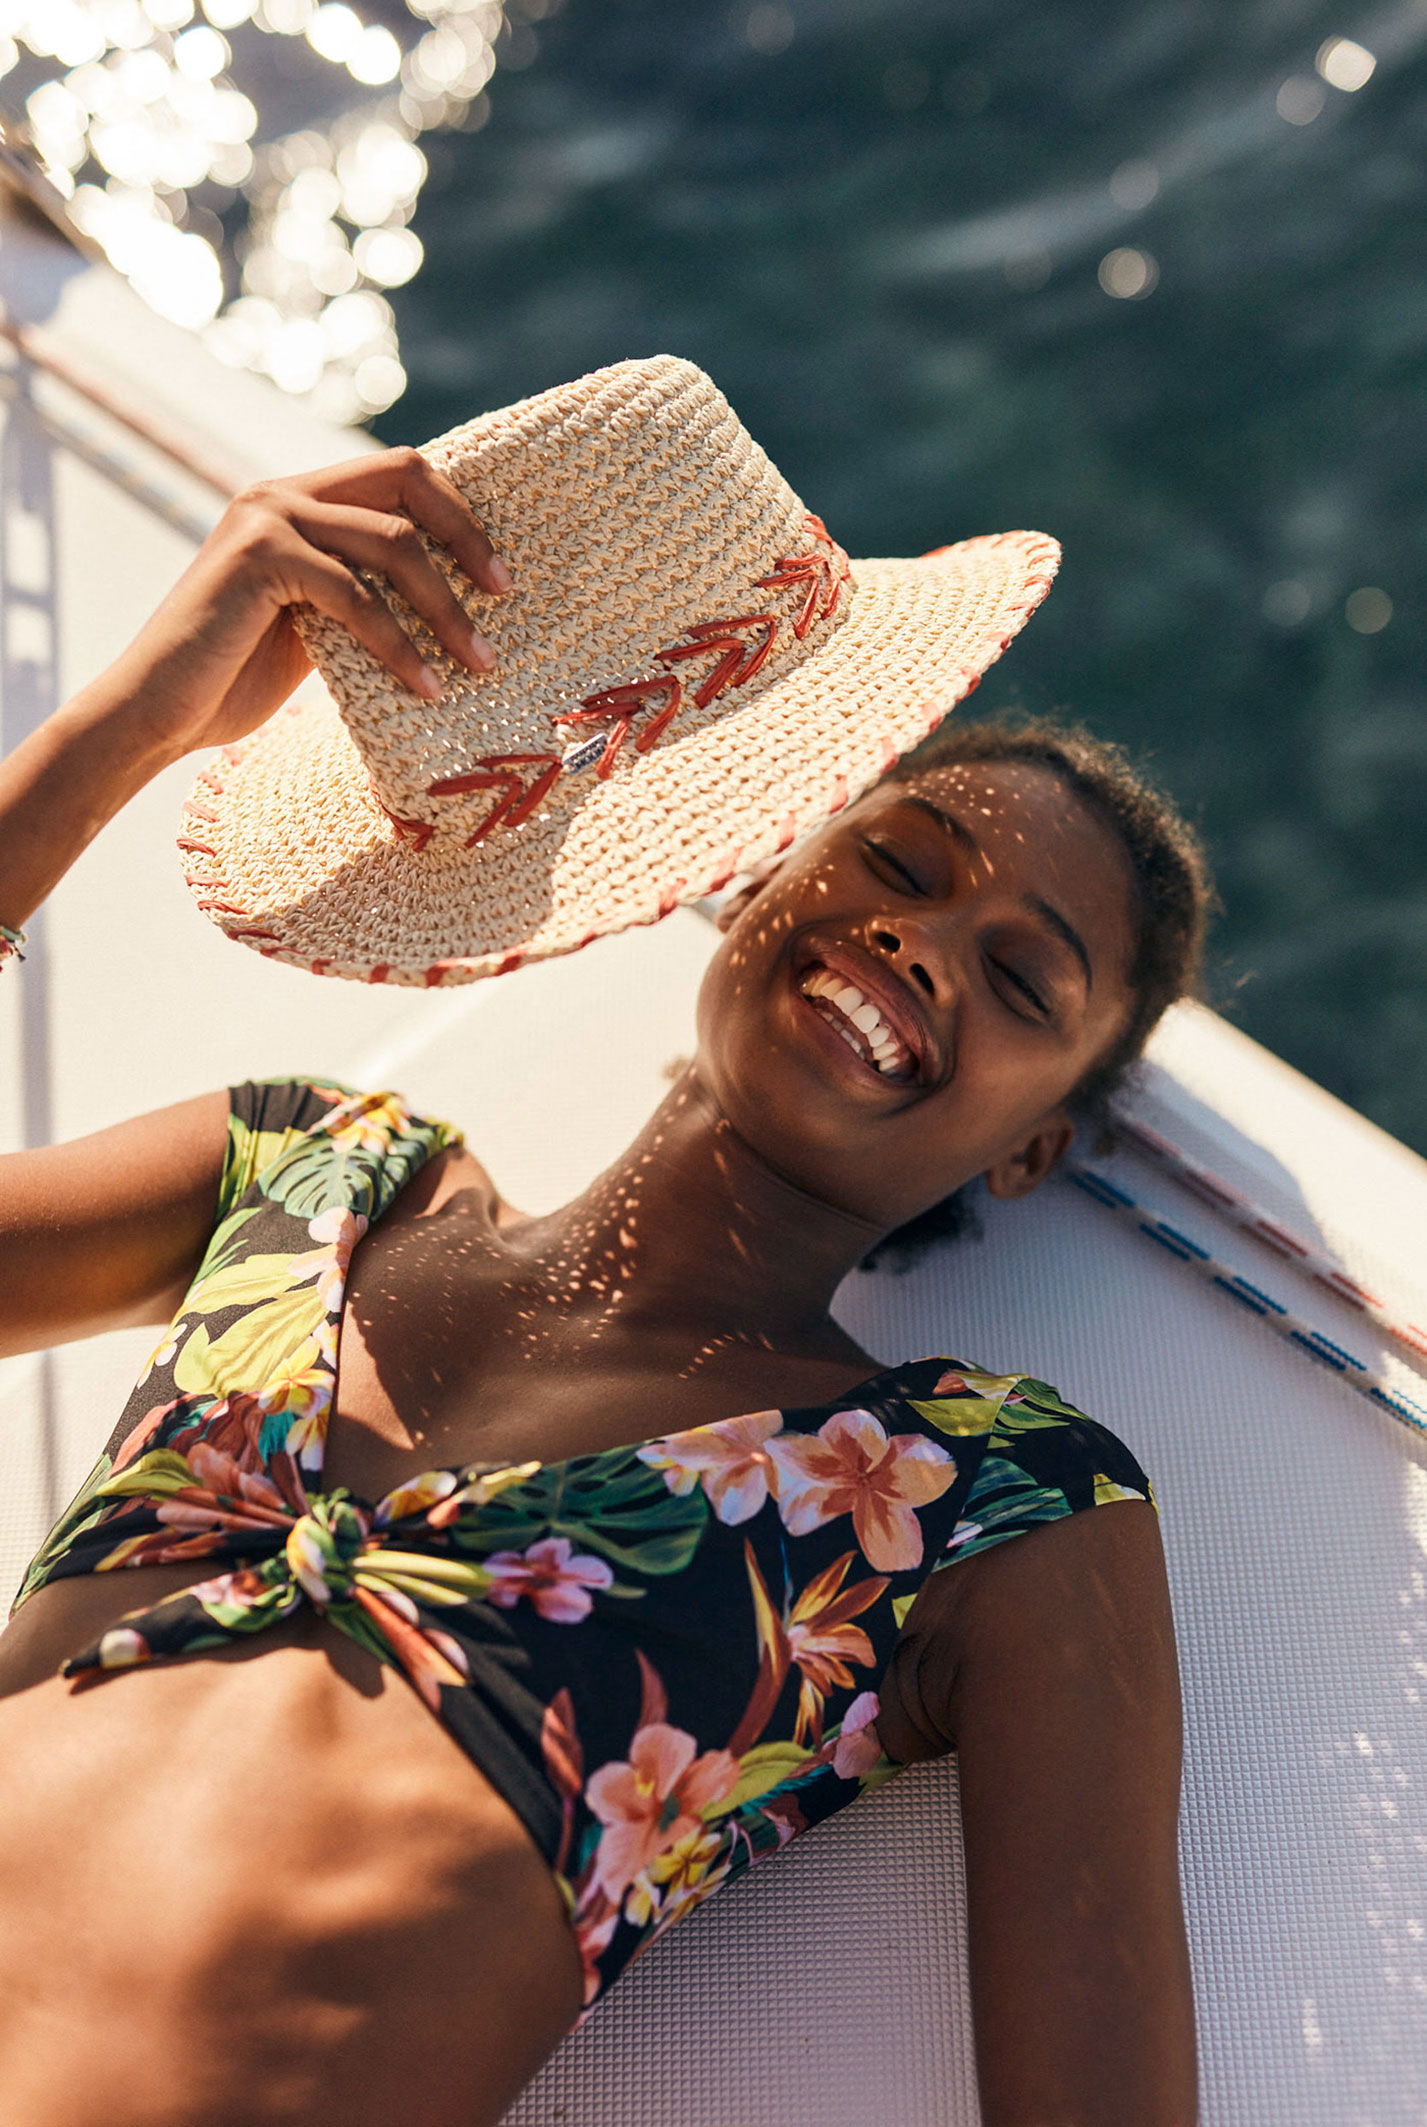 Делми Виейра в купальниках модного бренда Banana Moon, лето 2021 / фото 02